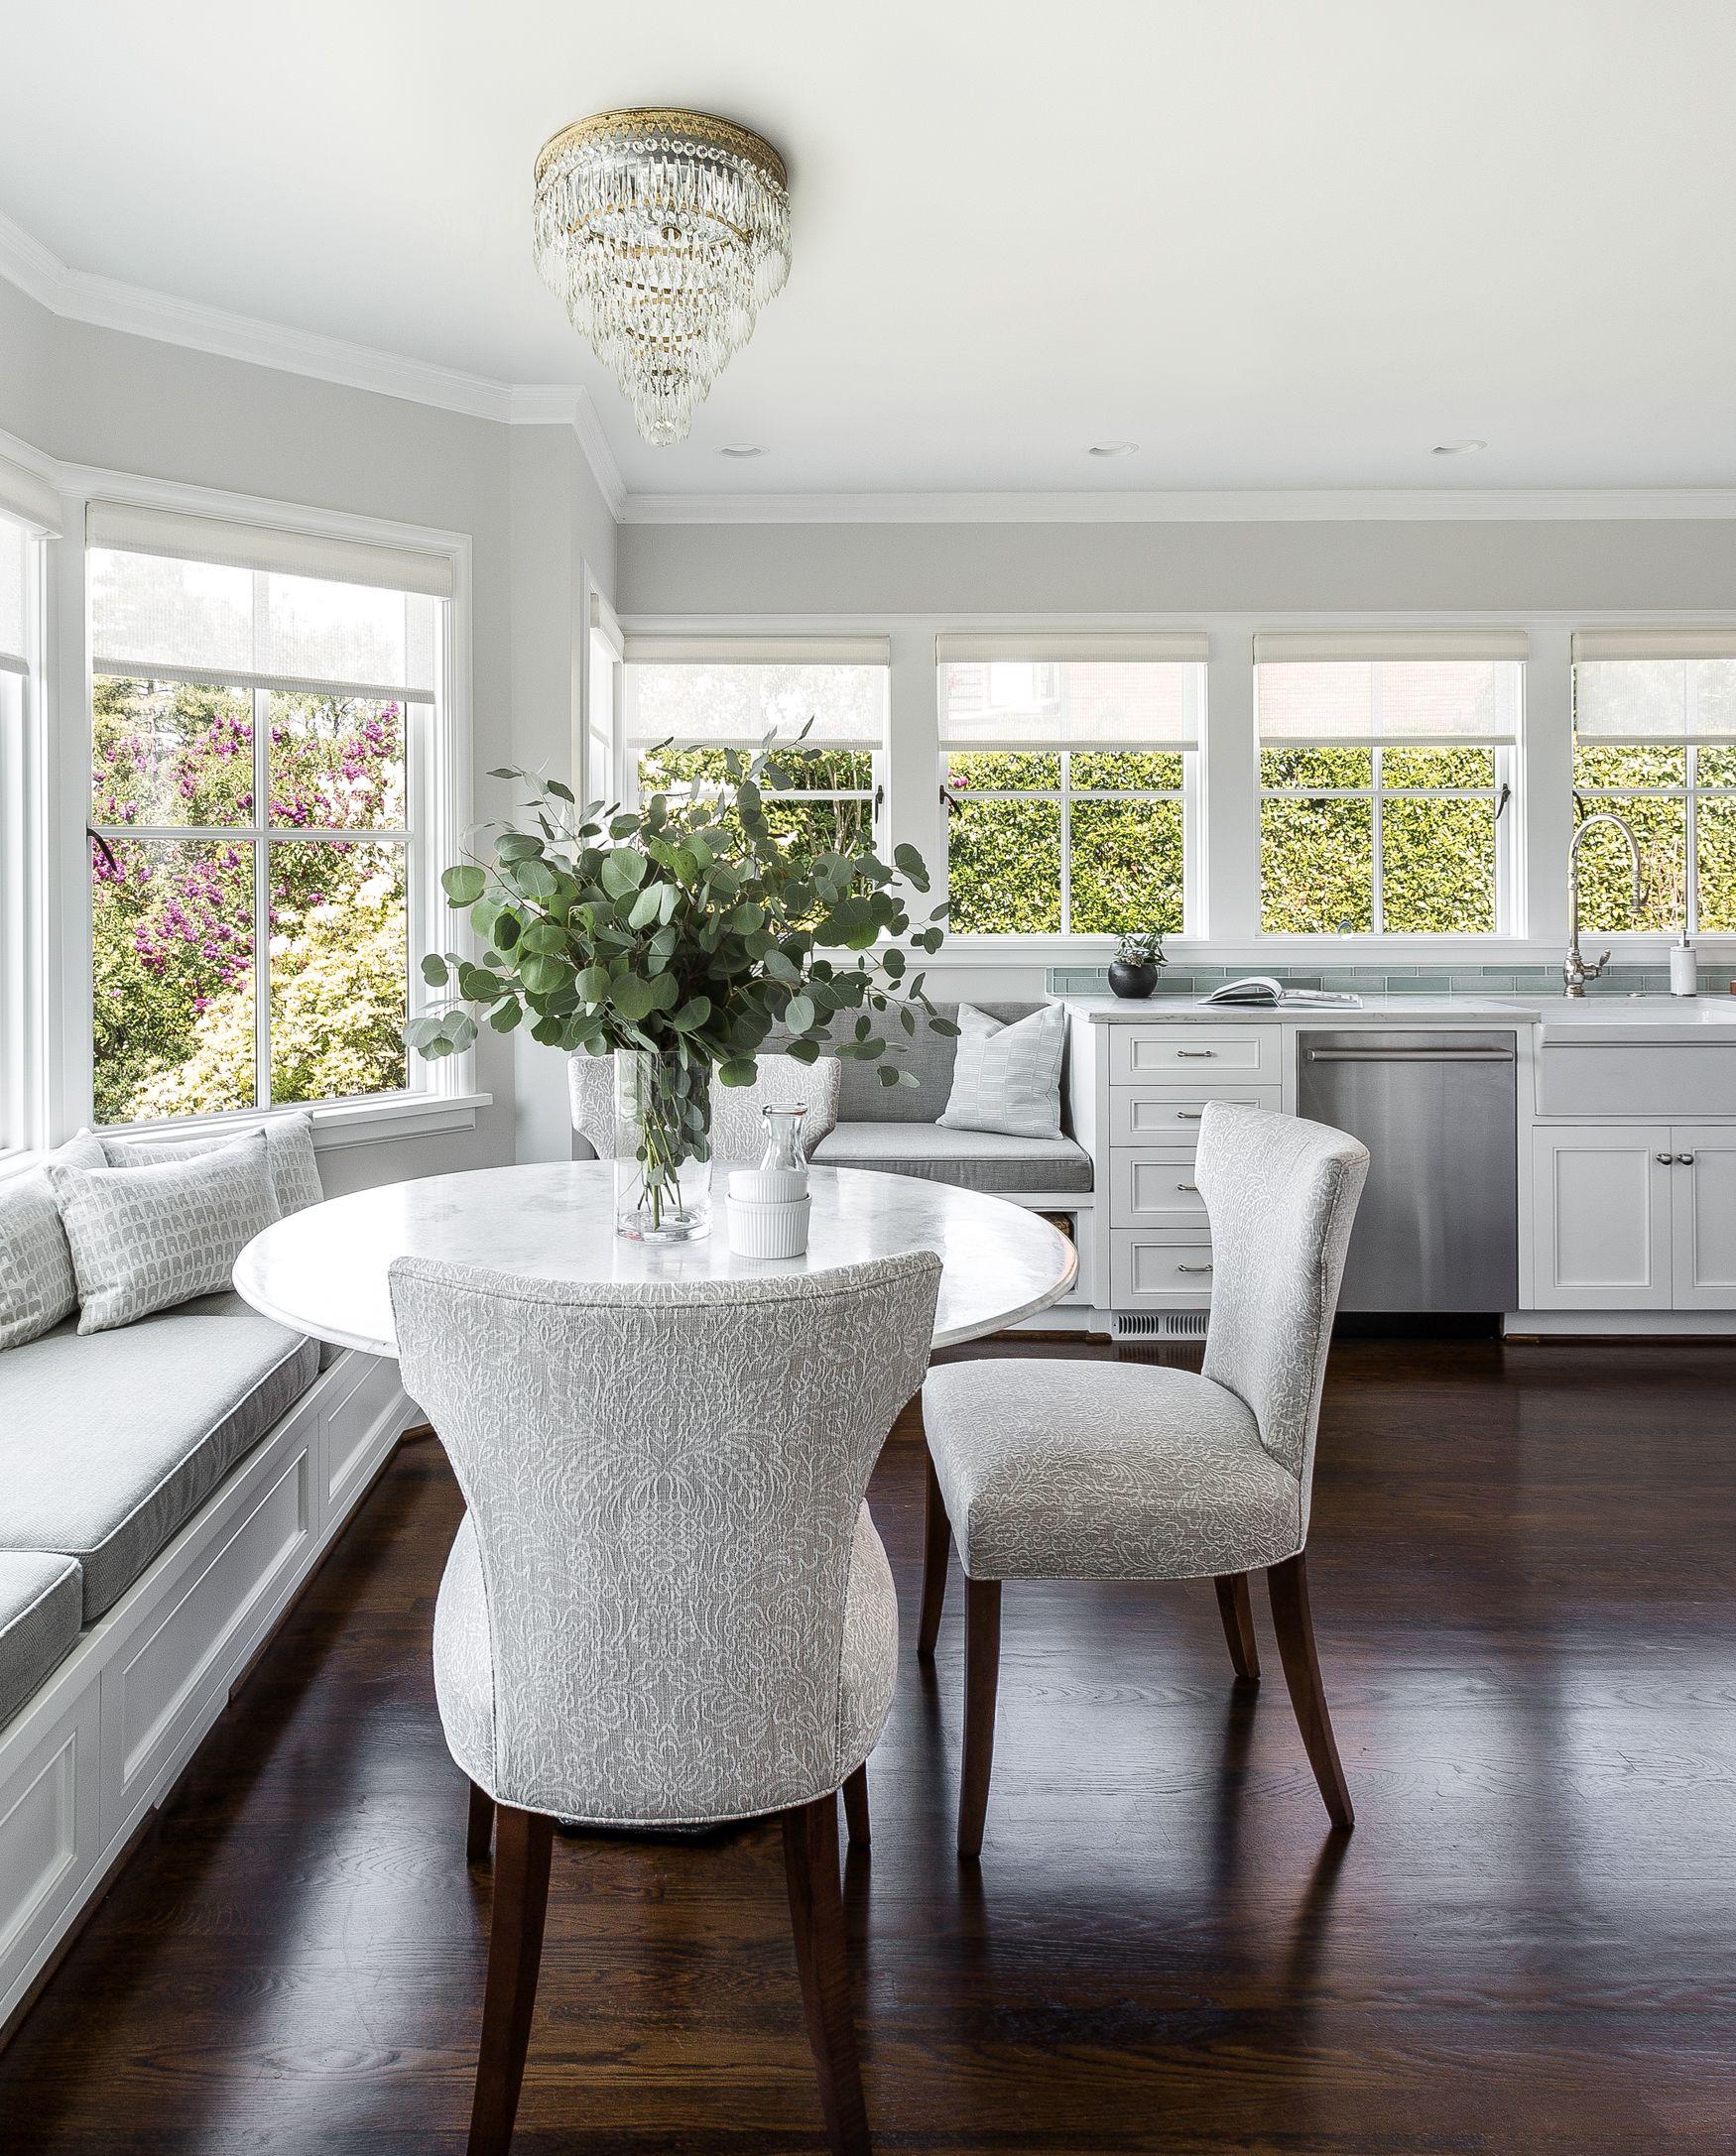 Magnolia Homes Interiors: Interior, Home Decor